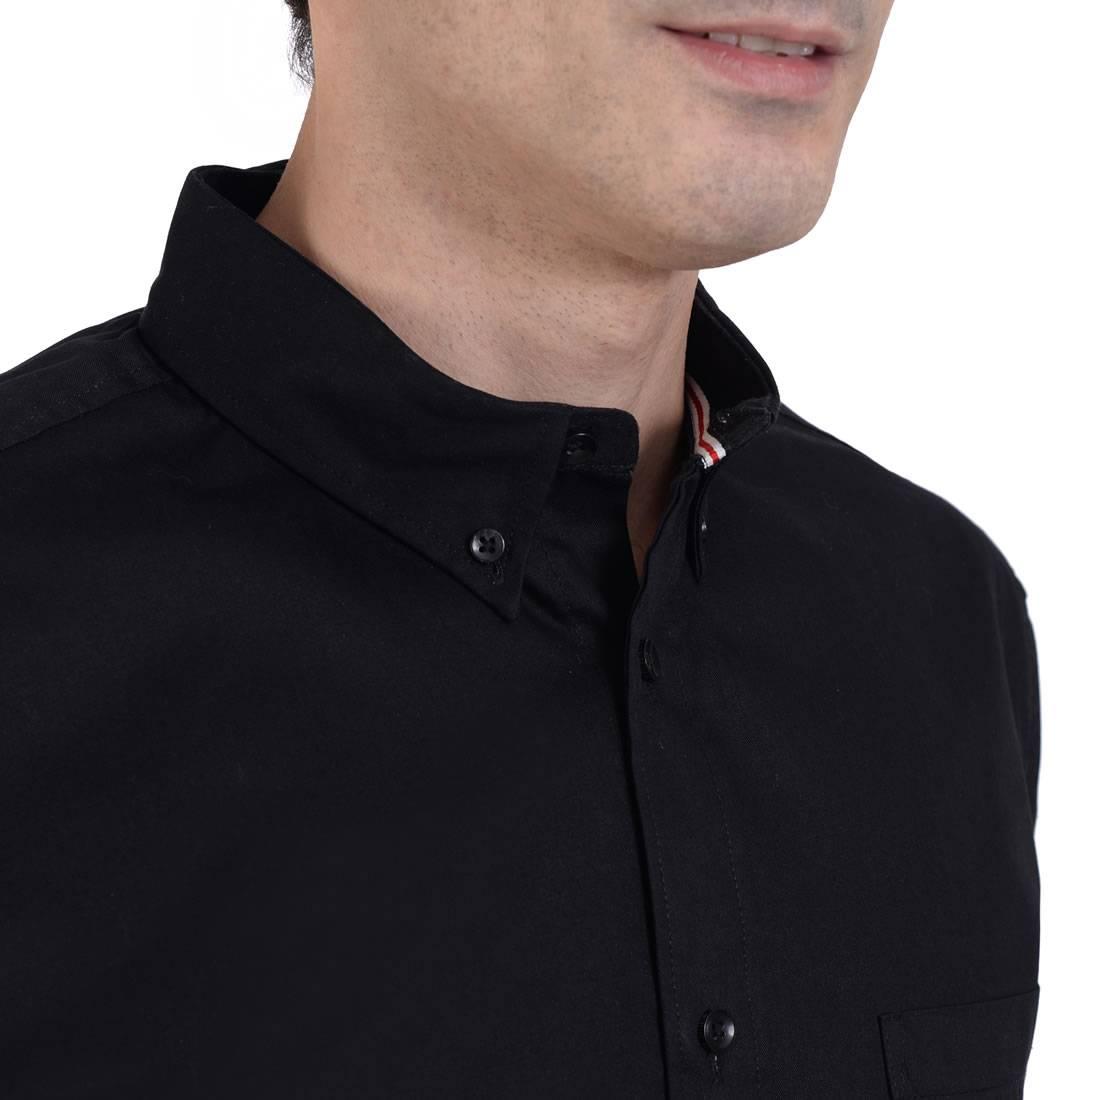 042331381709-04-Camisa-Manga-Corta-classic-Fit-Negro-yale